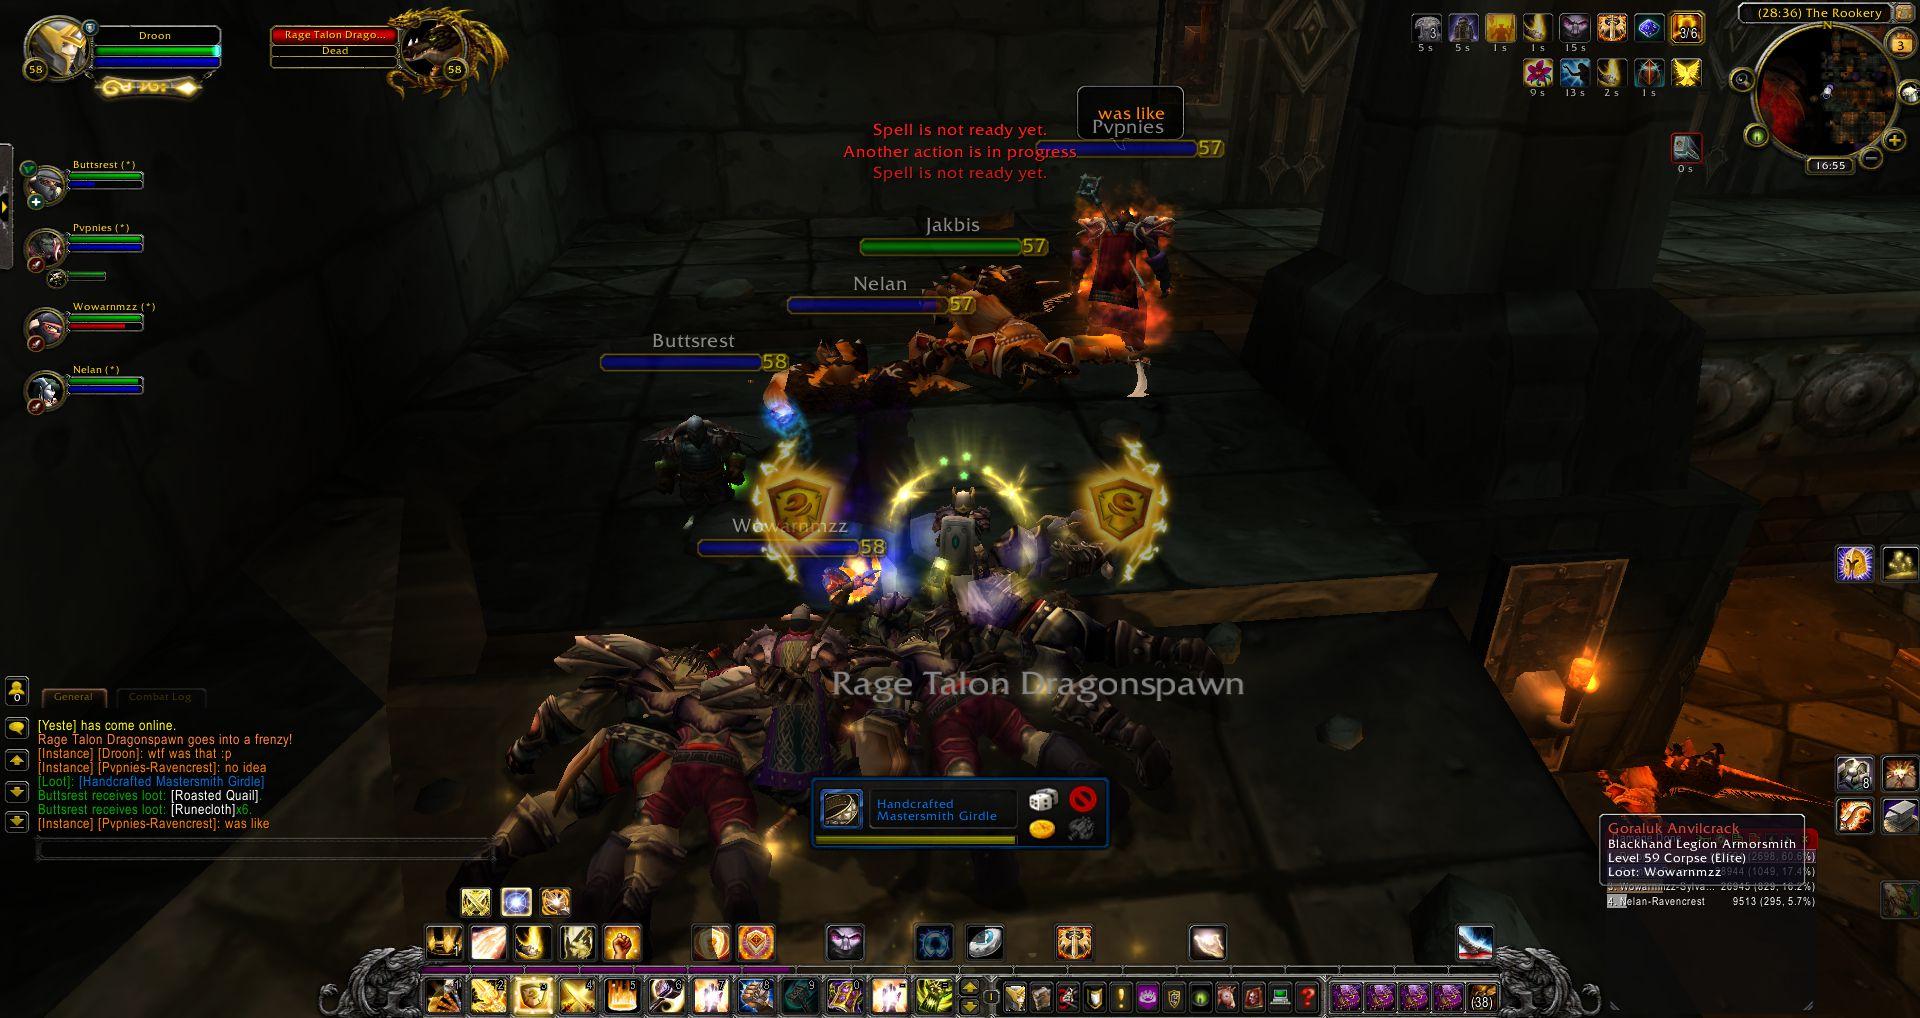 Upper Blackrock Spire wow screenshot - Gamingcfg com